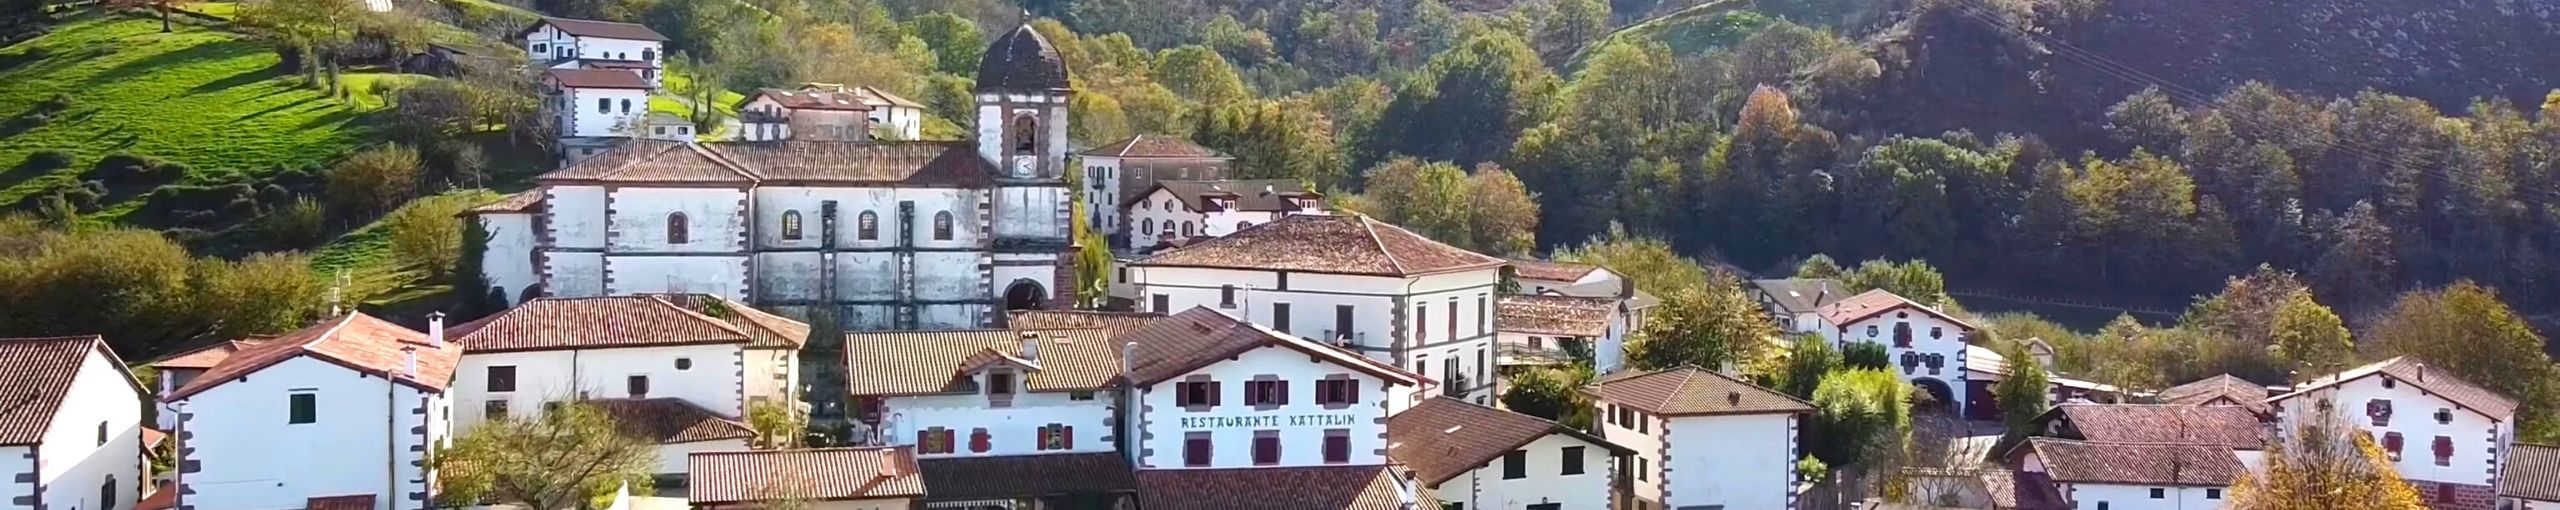 Zugarramurdi, Navarra.